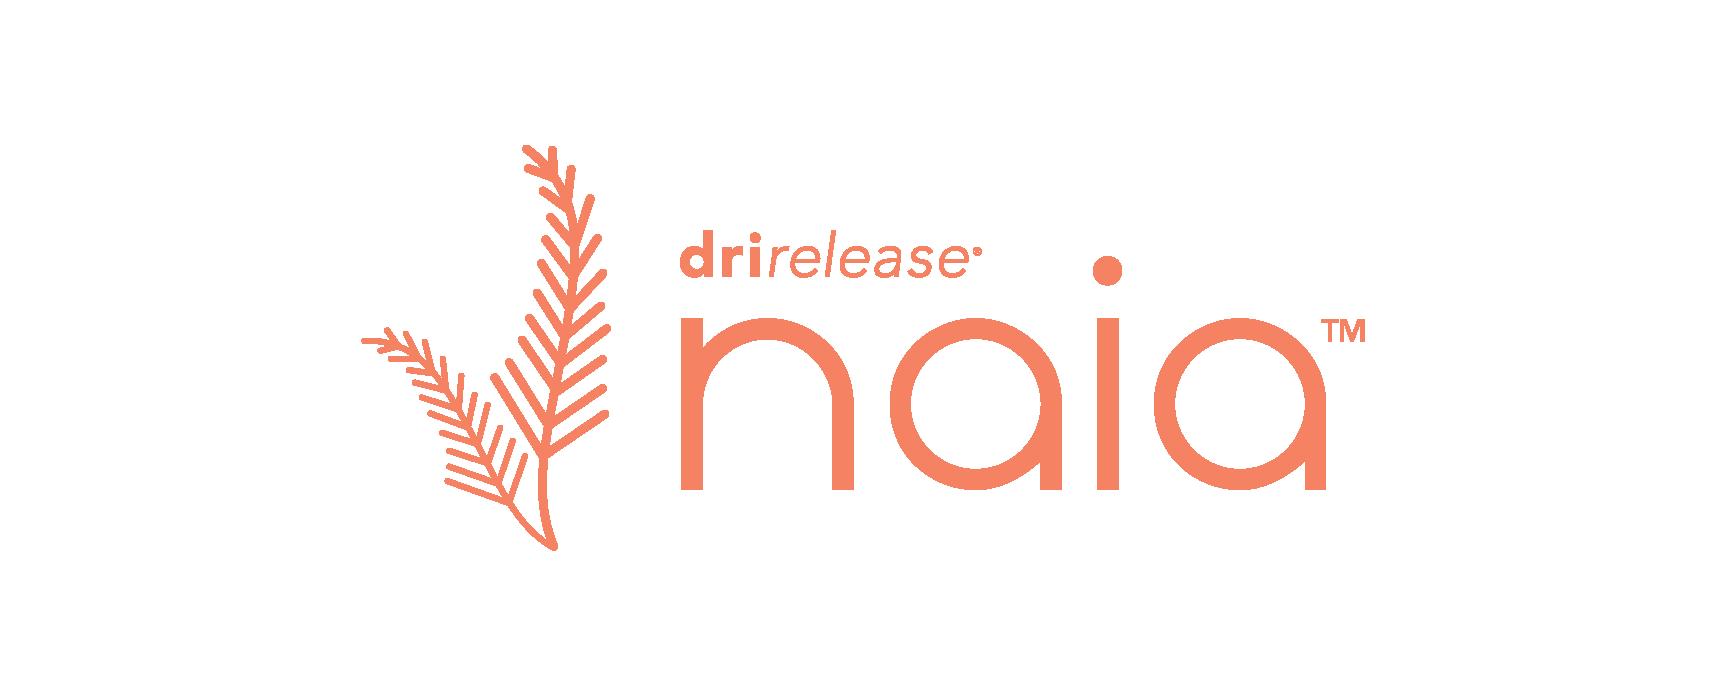 drirelease_Blends_naia